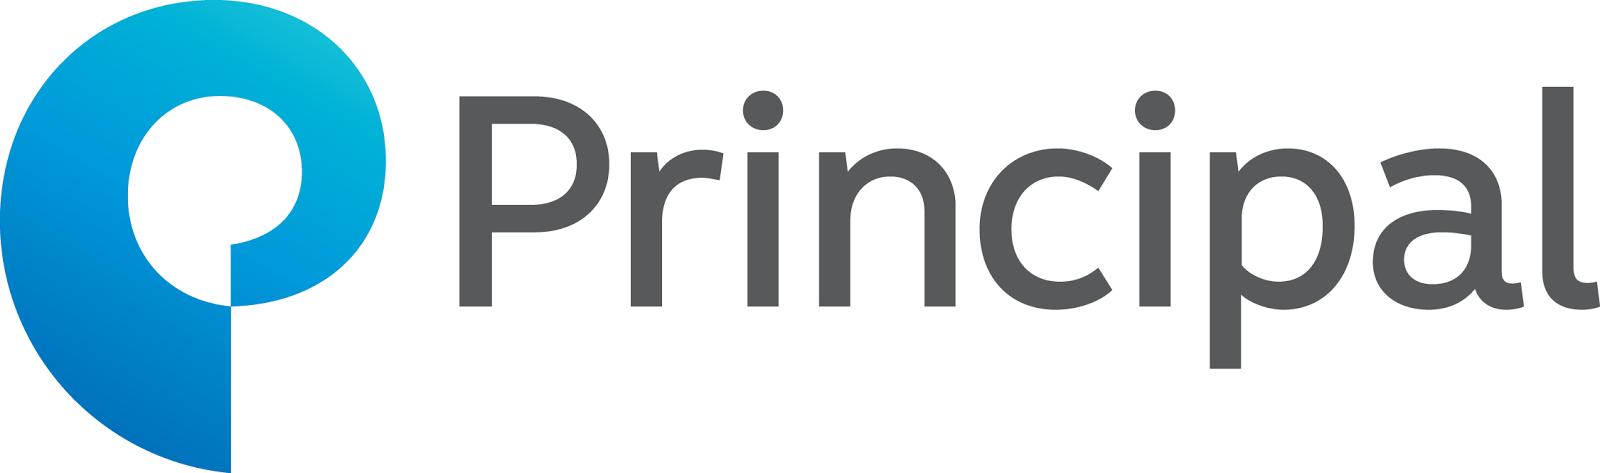 The branding source lippincott creates caring identity for principal